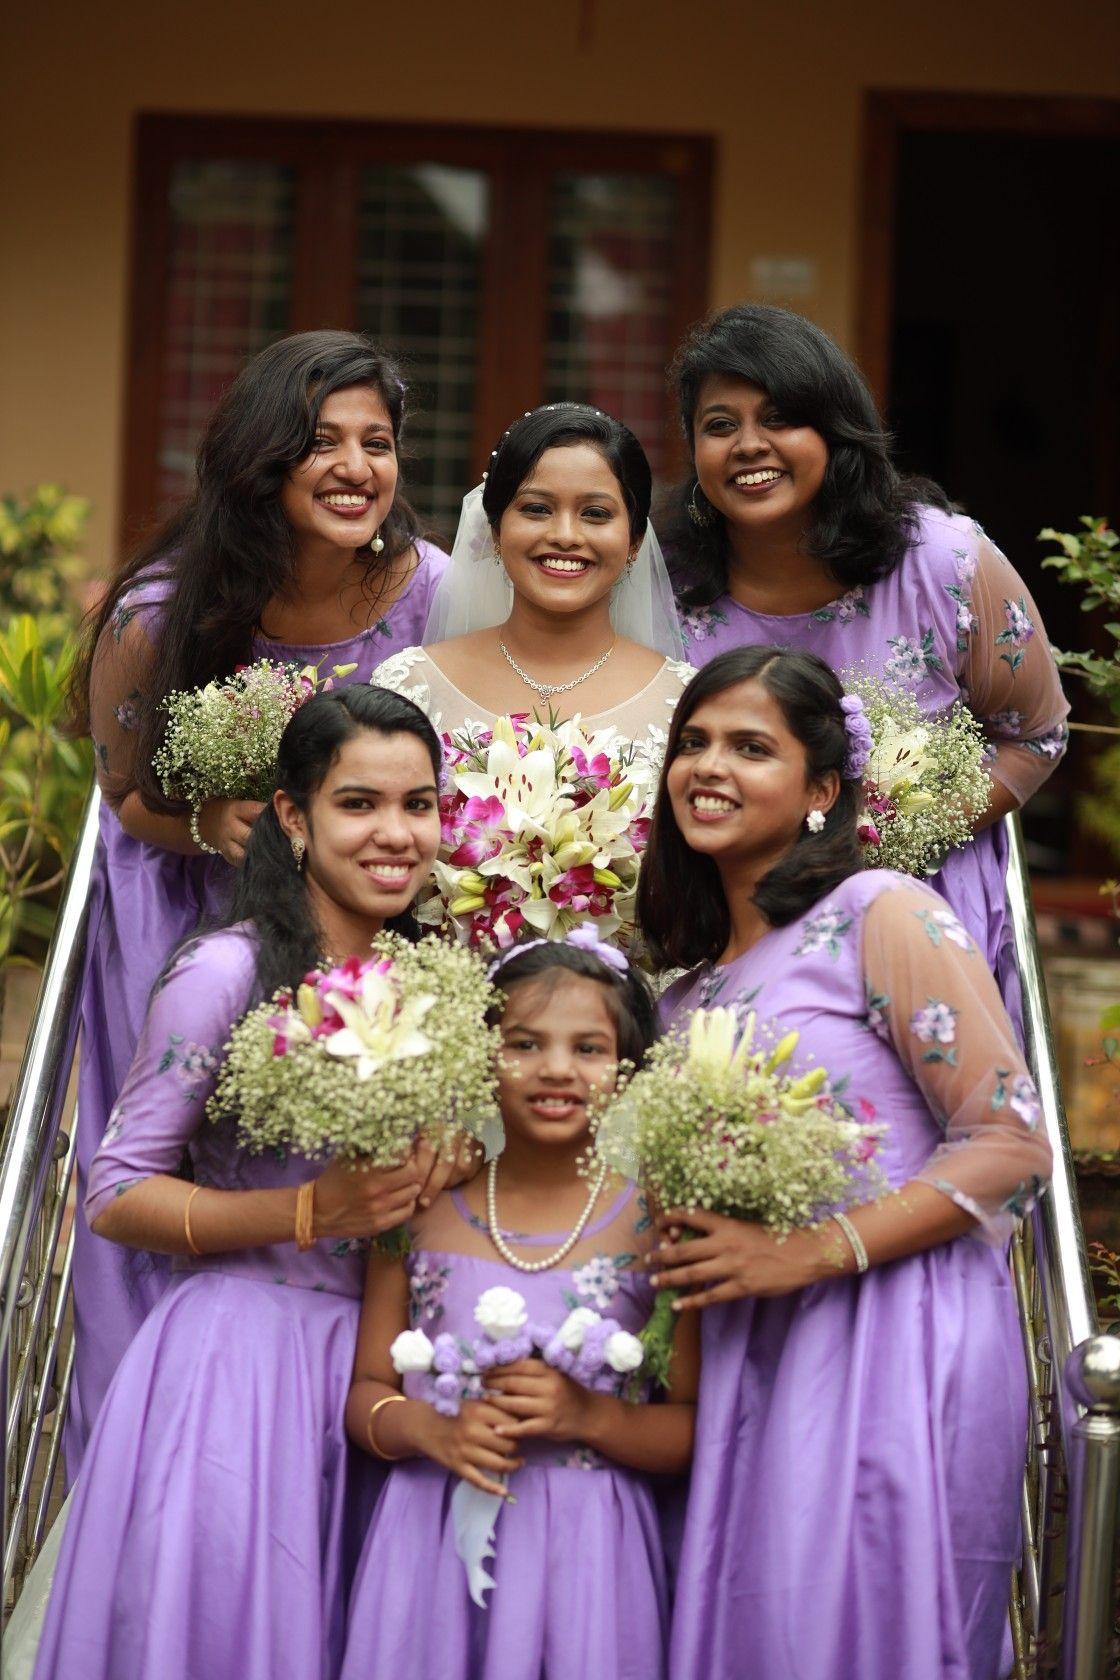 Kerala Christian Wedding Bride Flower Girl Dresses Wedding [ 1680 x 1120 Pixel ]